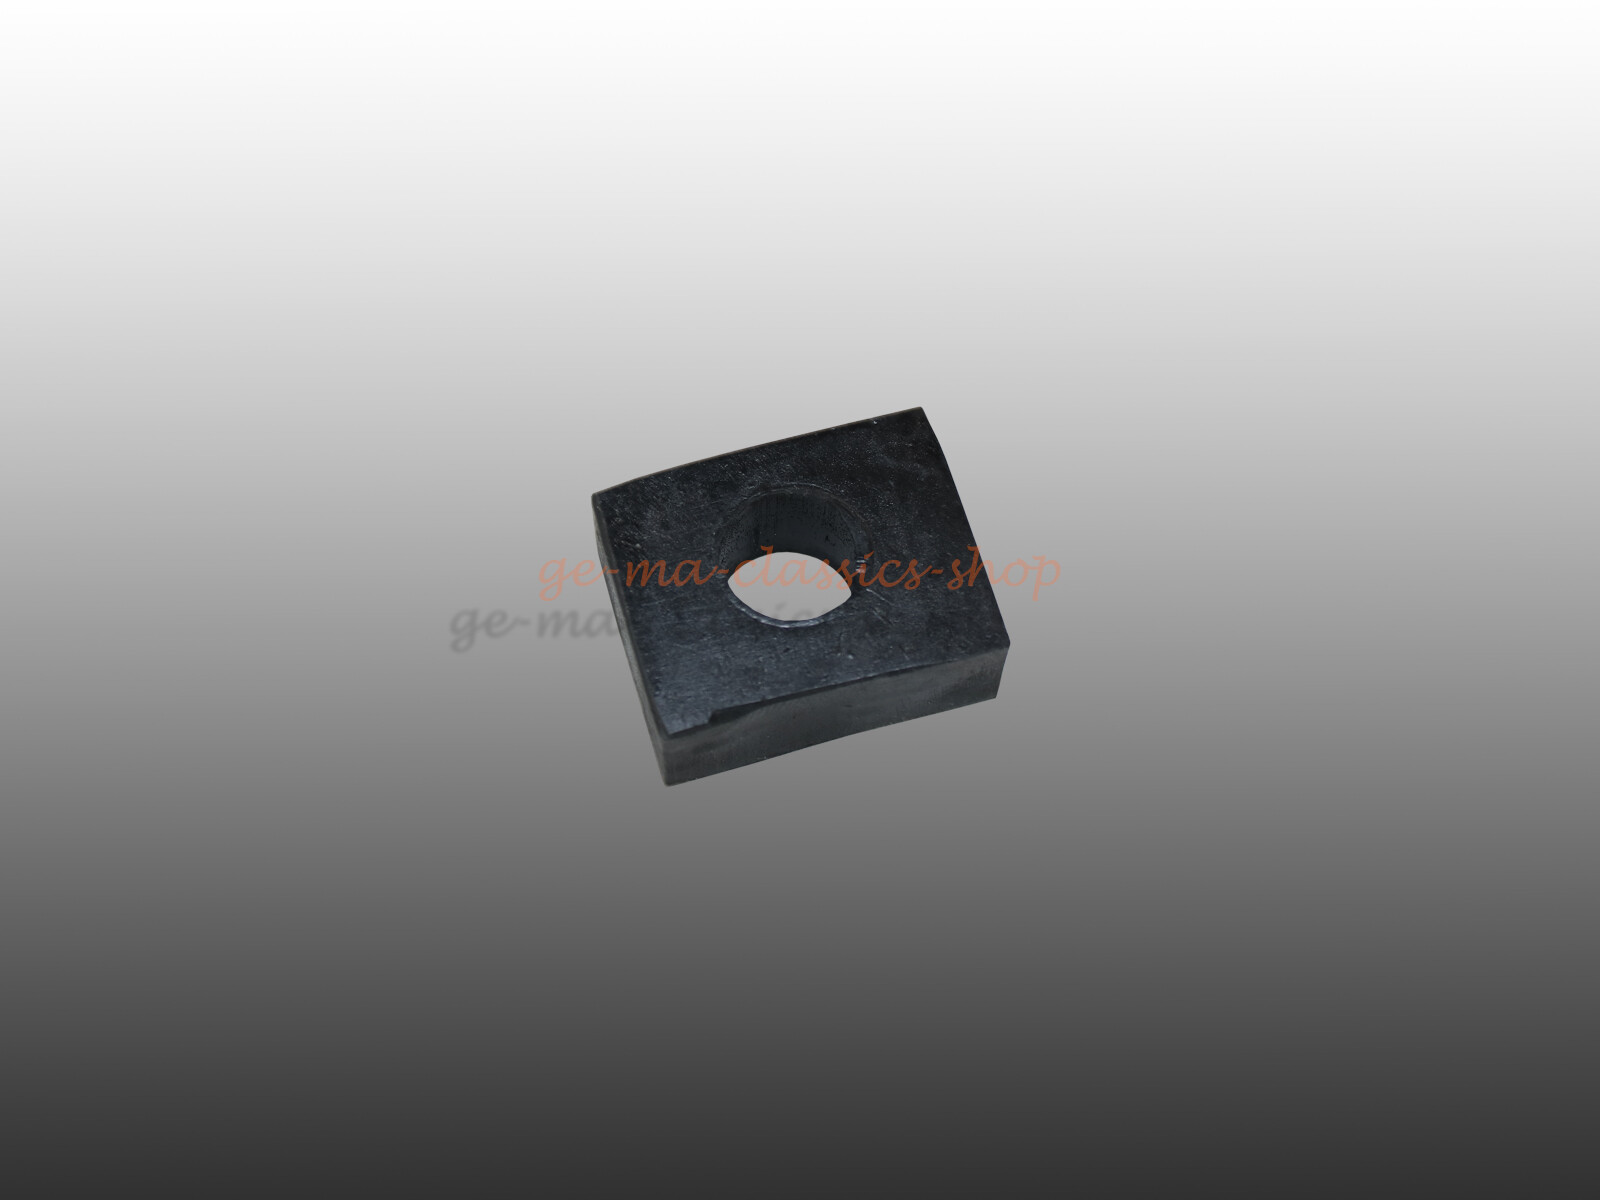 Gummiblock Aufbaustütze Unterlage Käfer Karmann Chassis 17mm